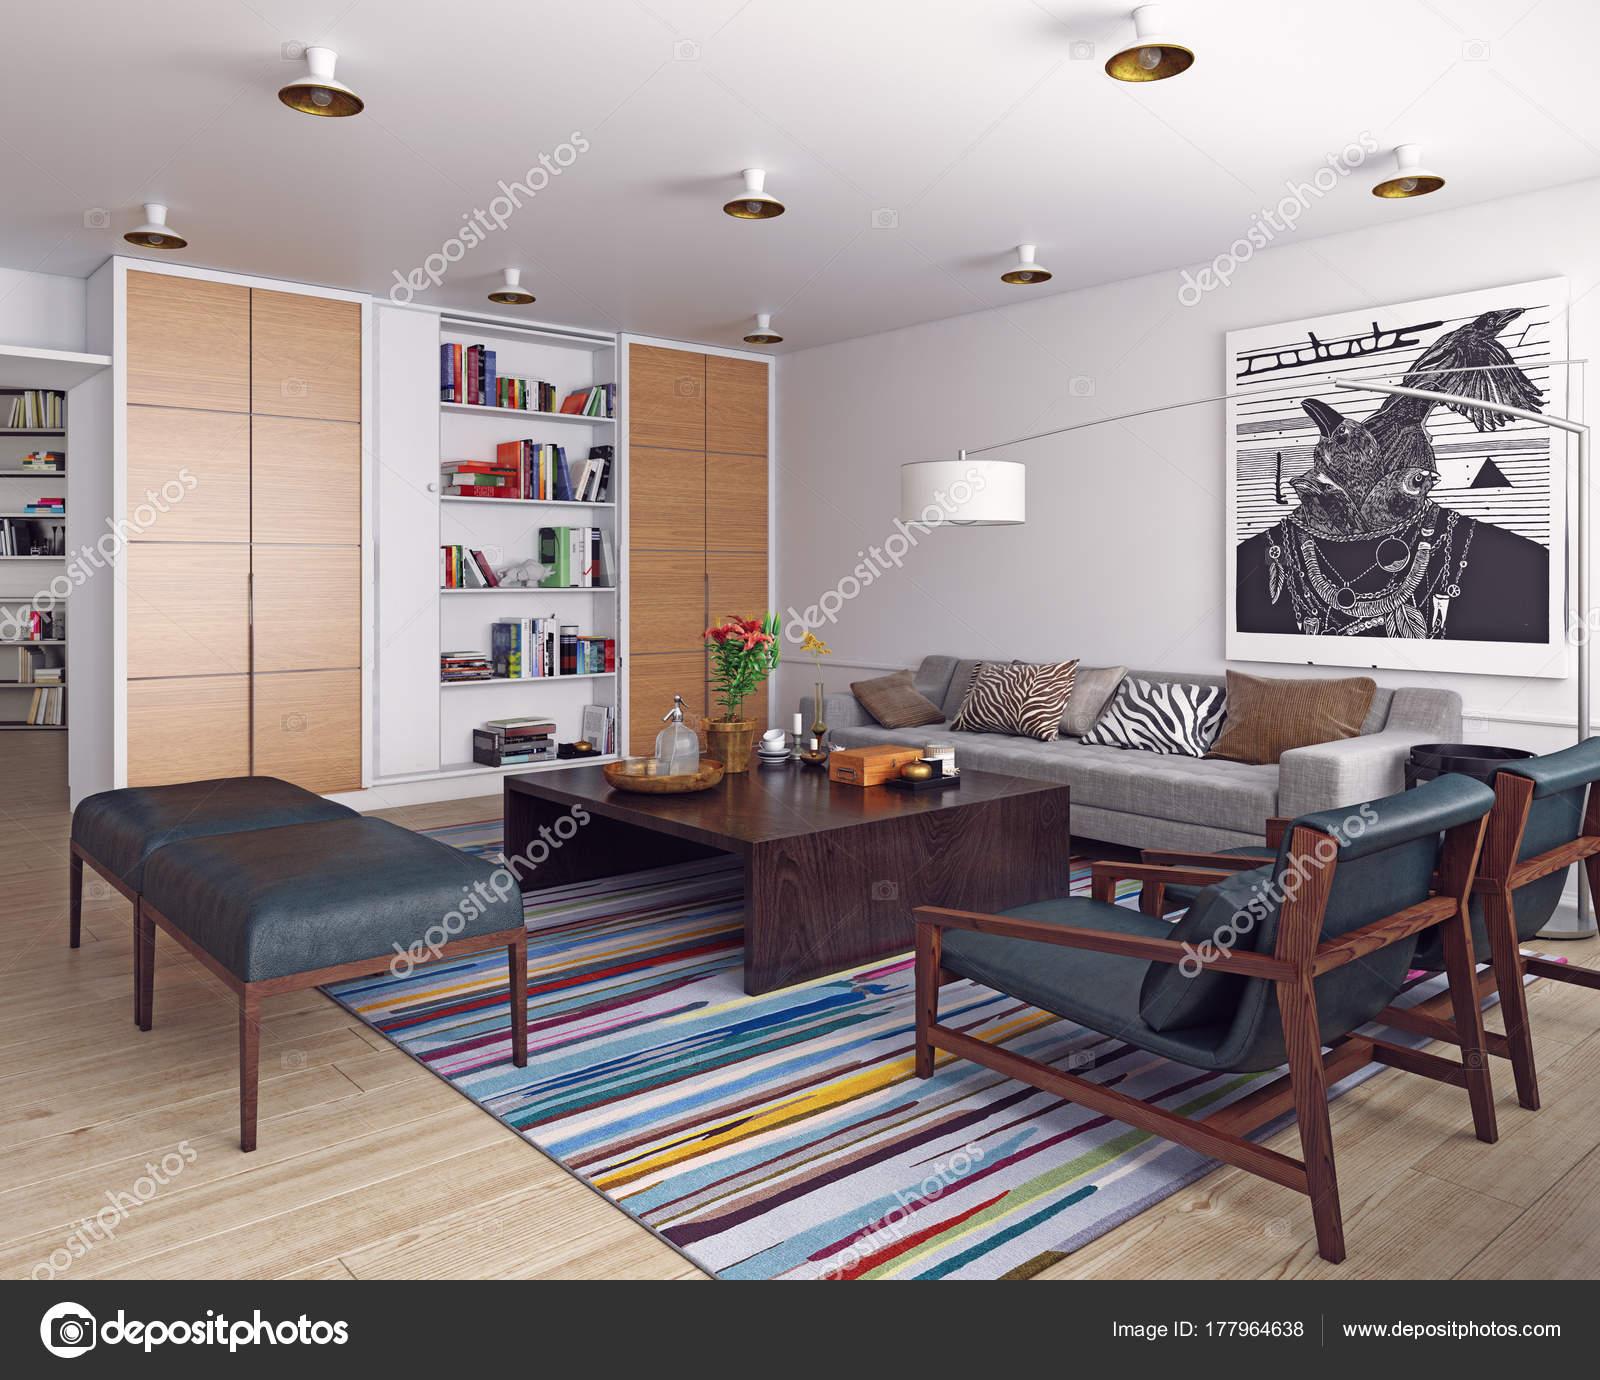 https://st3.depositphotos.com/1009647/17796/i/1600/depositphotos_177964638-stockafbeelding-moderne-woonkamer-ontwerp-rendering-interieurconcept.jpg